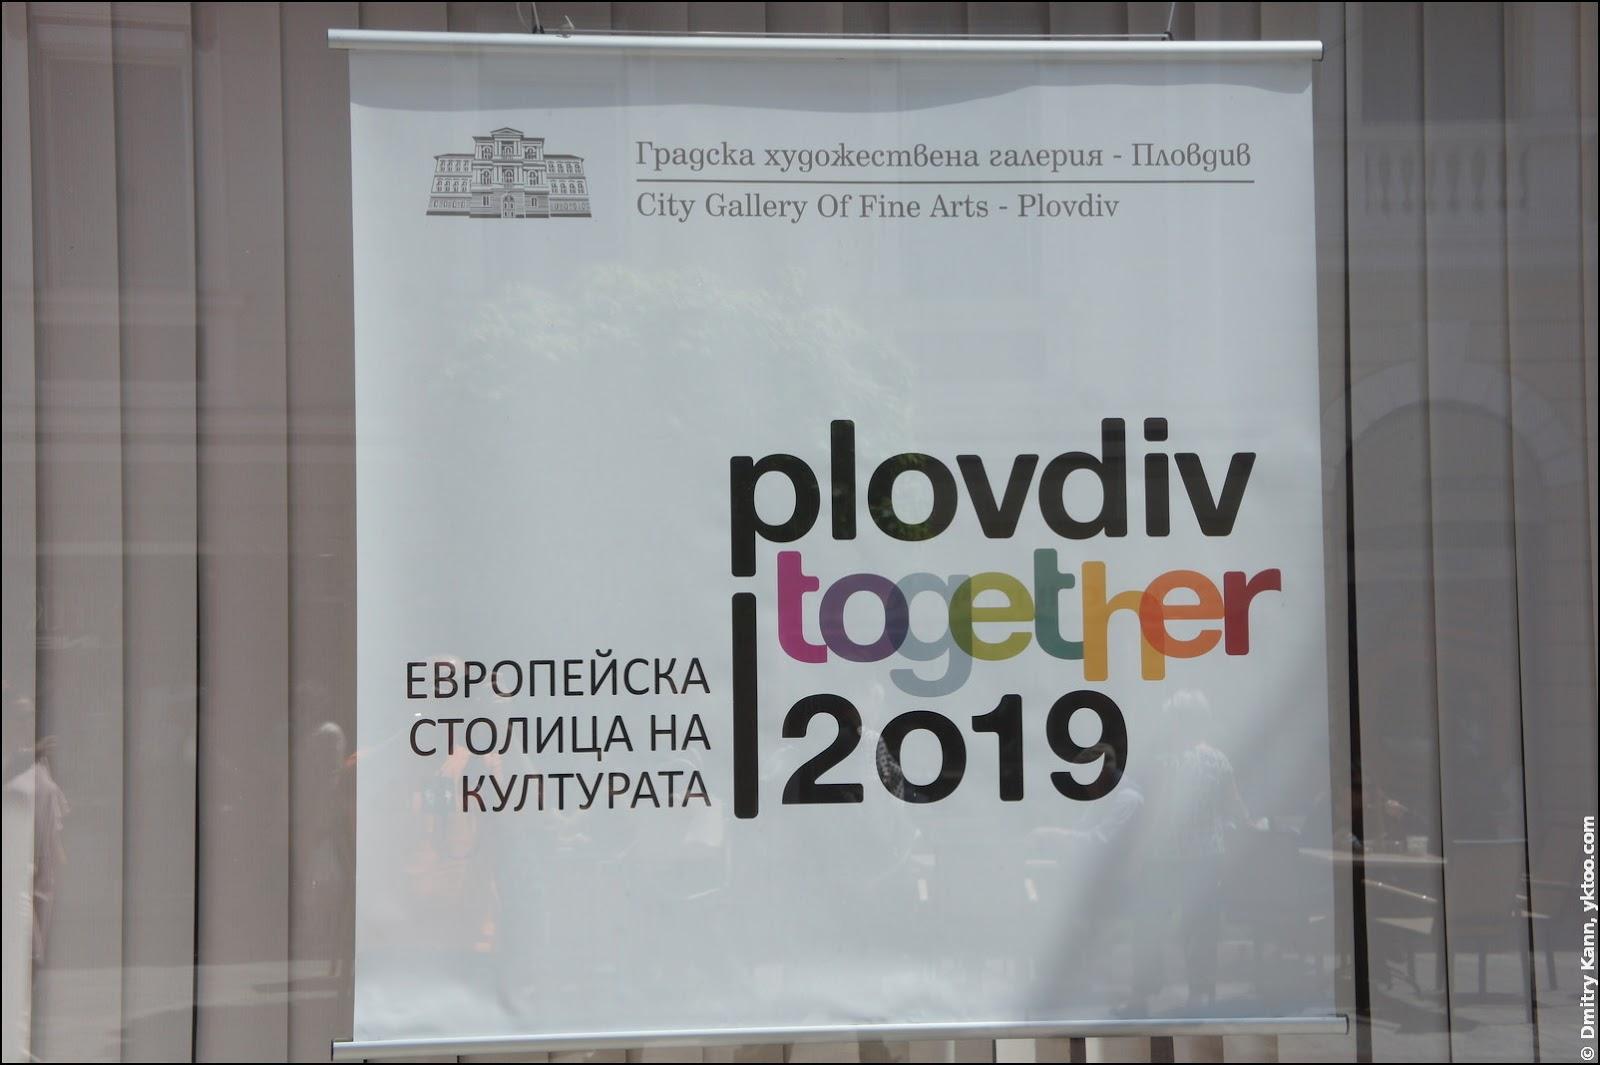 Plovidv Together 2019.